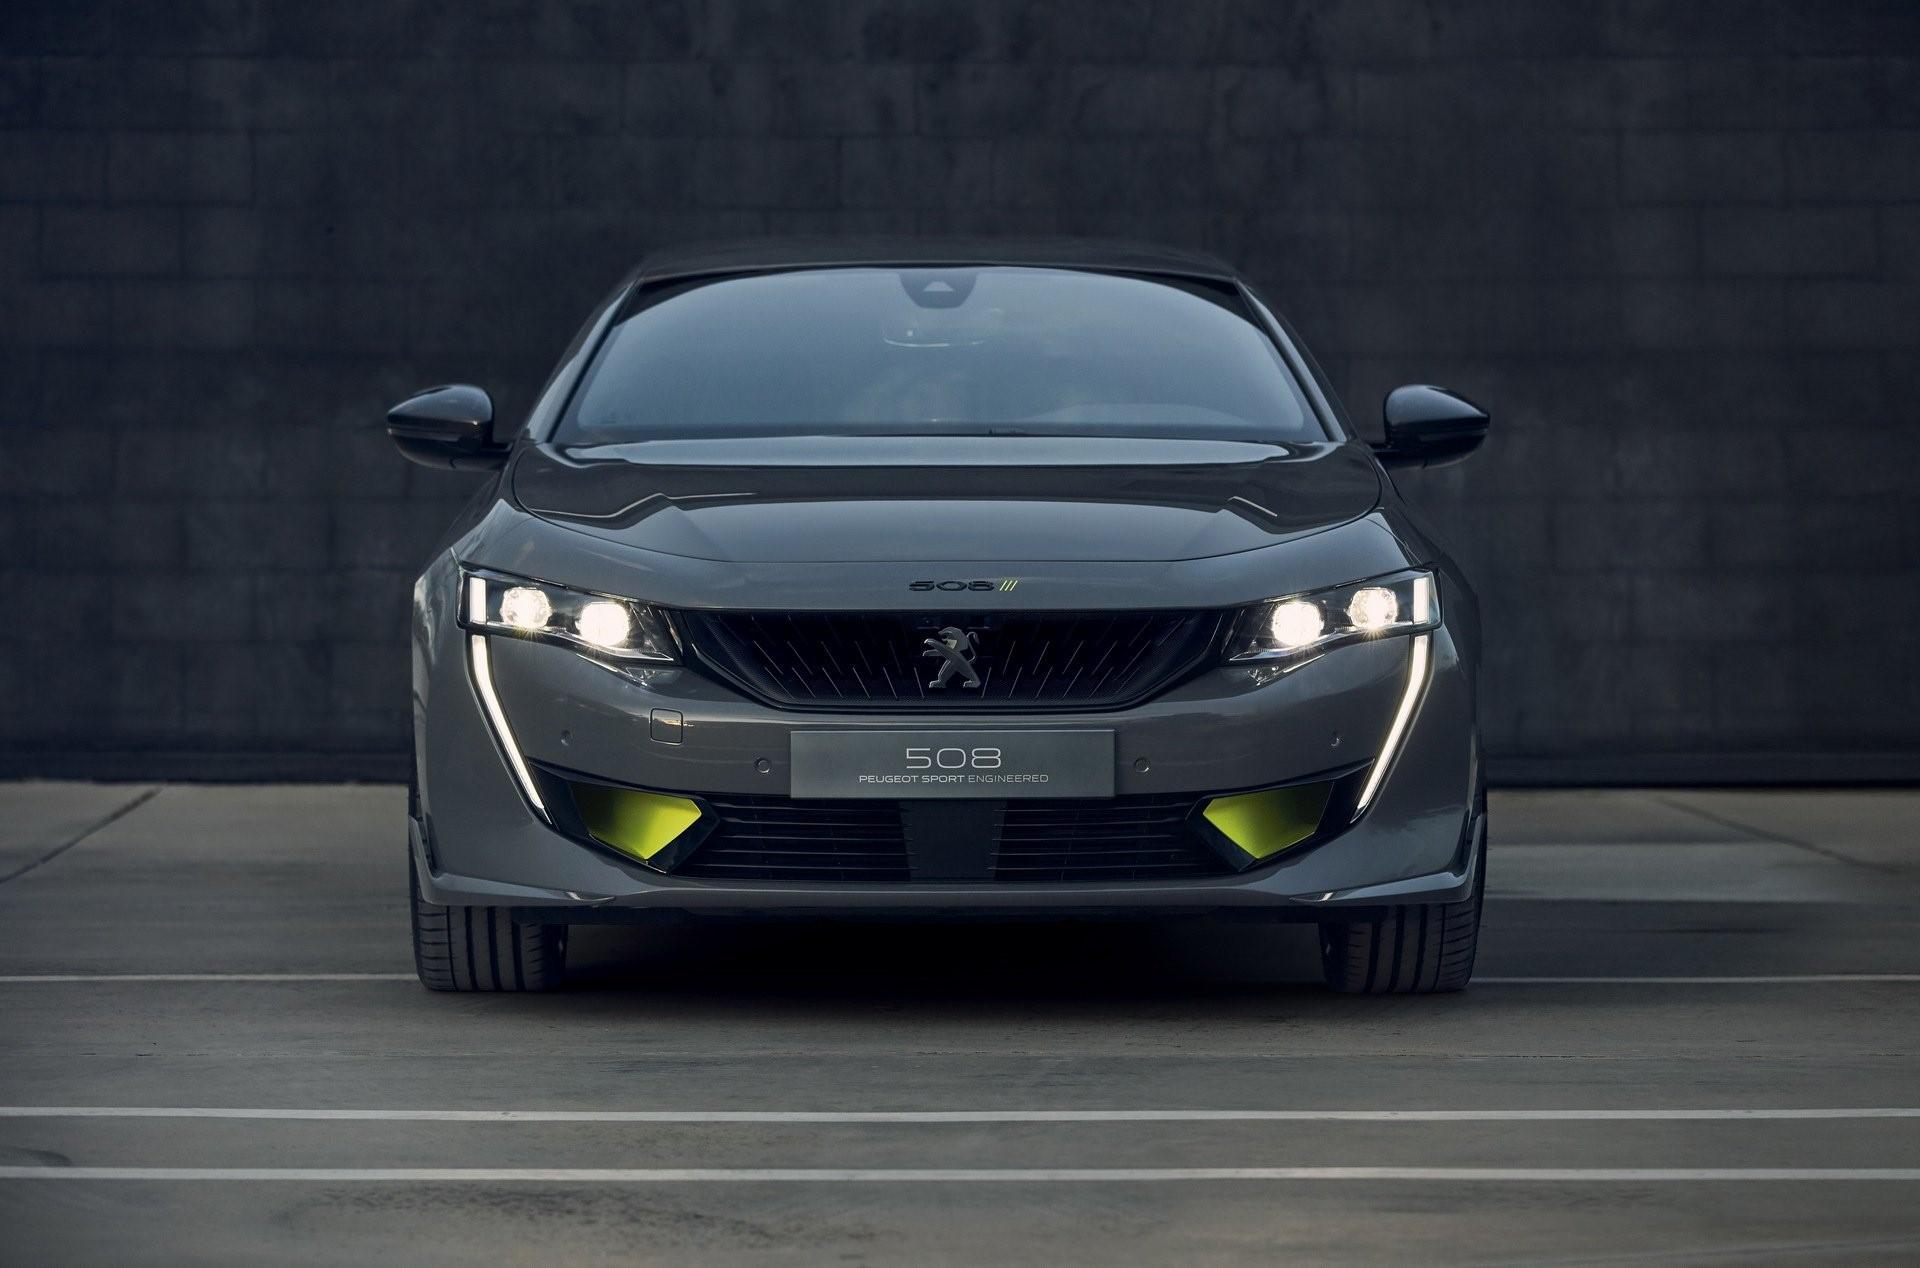 Peugeot 508 Sport Engineered Concept (80)